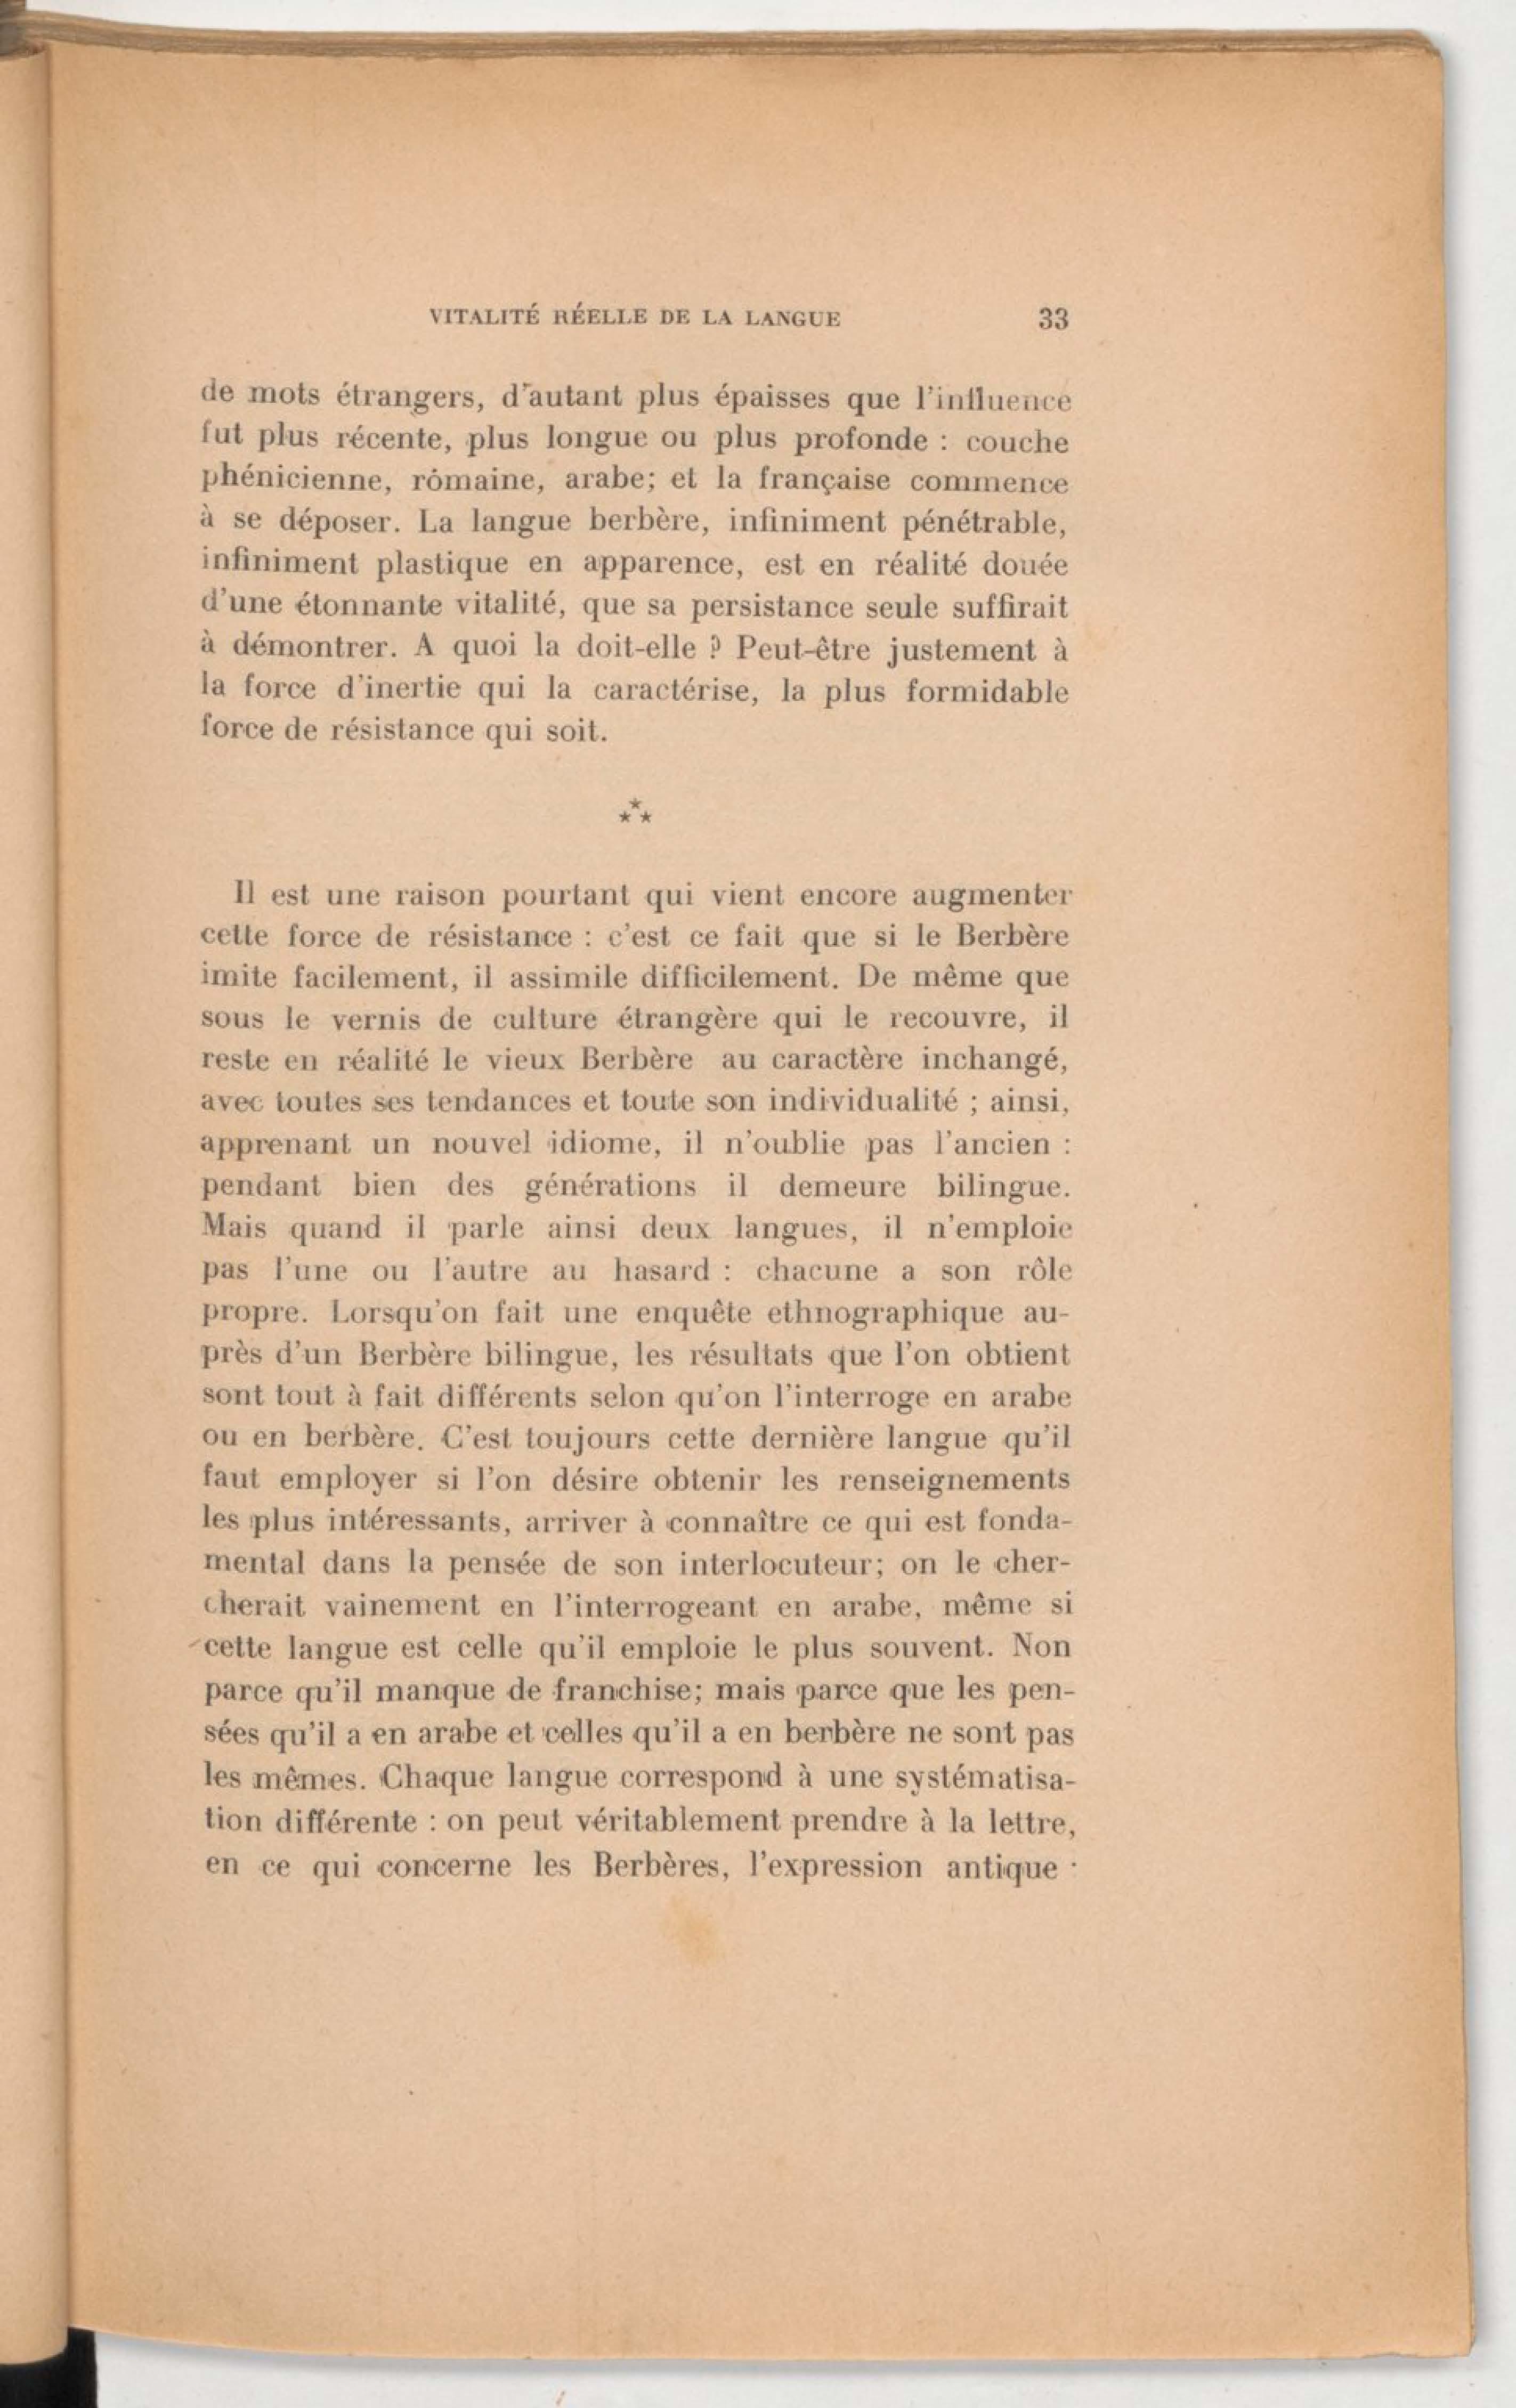 litterature-des-berberes_page_039